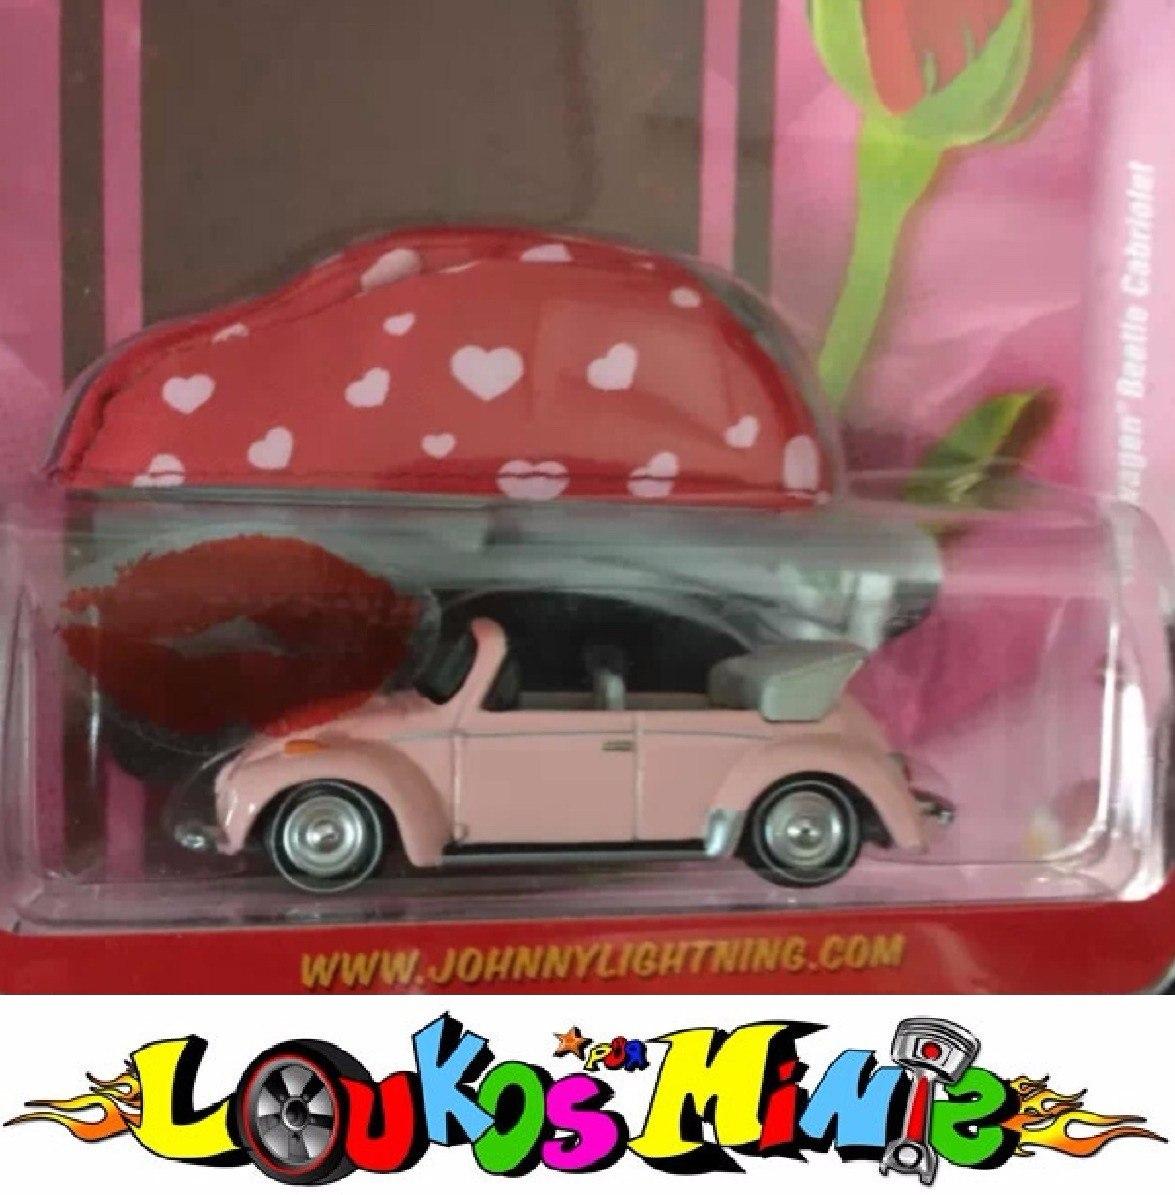 Loukosporminis Johnny Lightning 75 Vw Beetle Cabriolet Fusca Rosa Pink 1 64 R 199 99